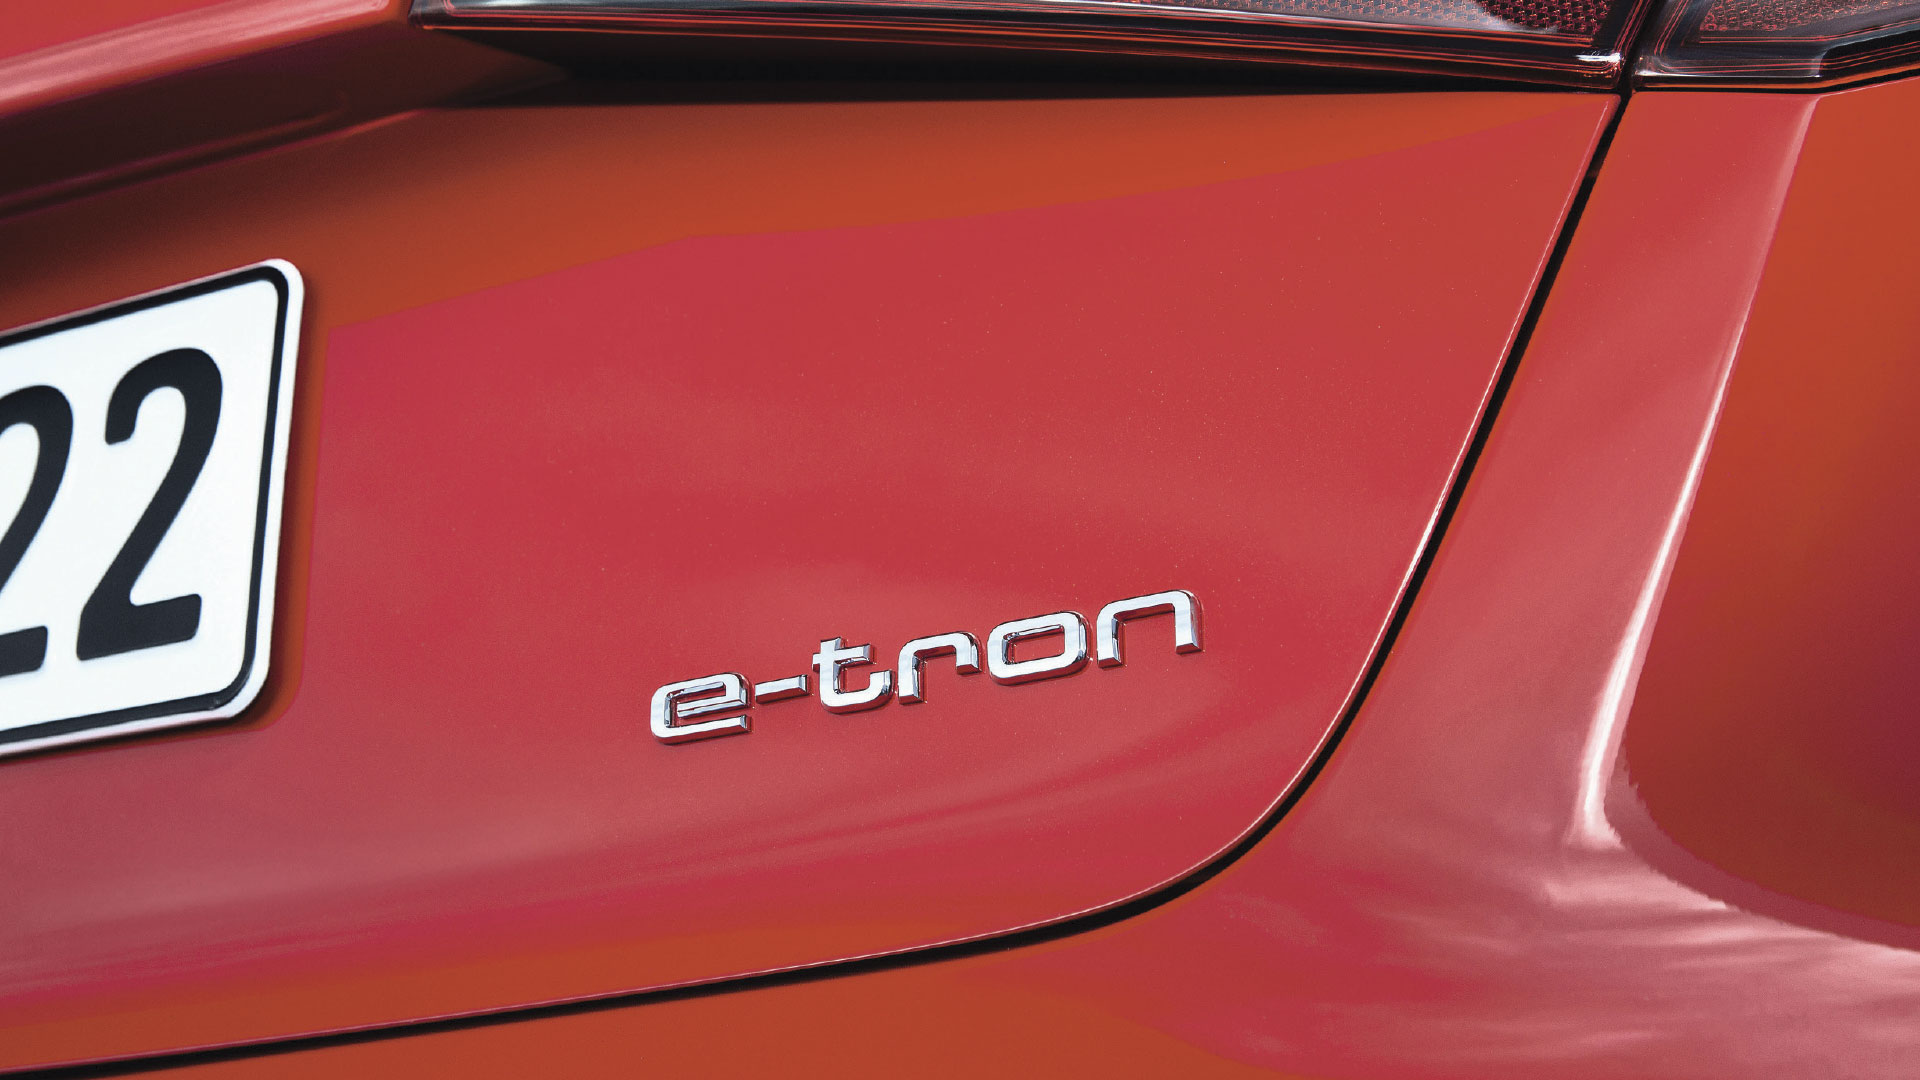 Audi E-Tron Alibaba